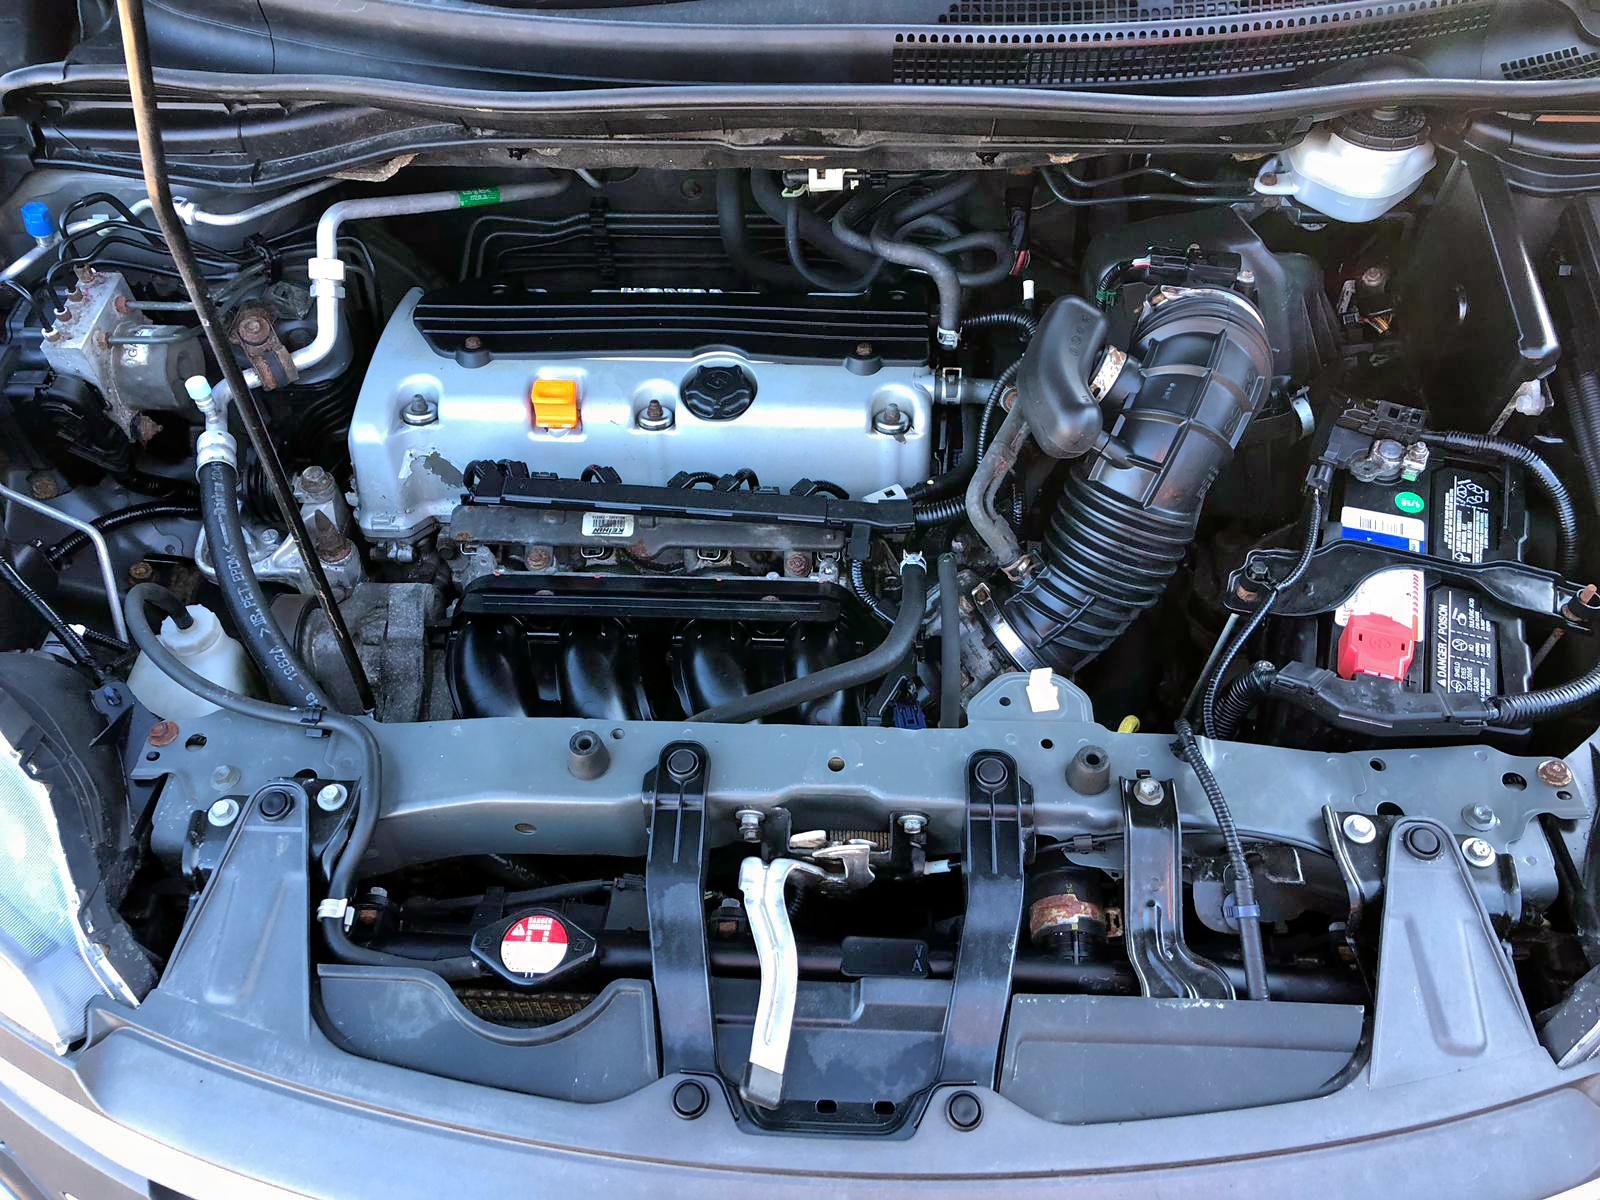 2HKRM4H73CH626699 - 2012 Honda Cr-V Exl 2.4L front view